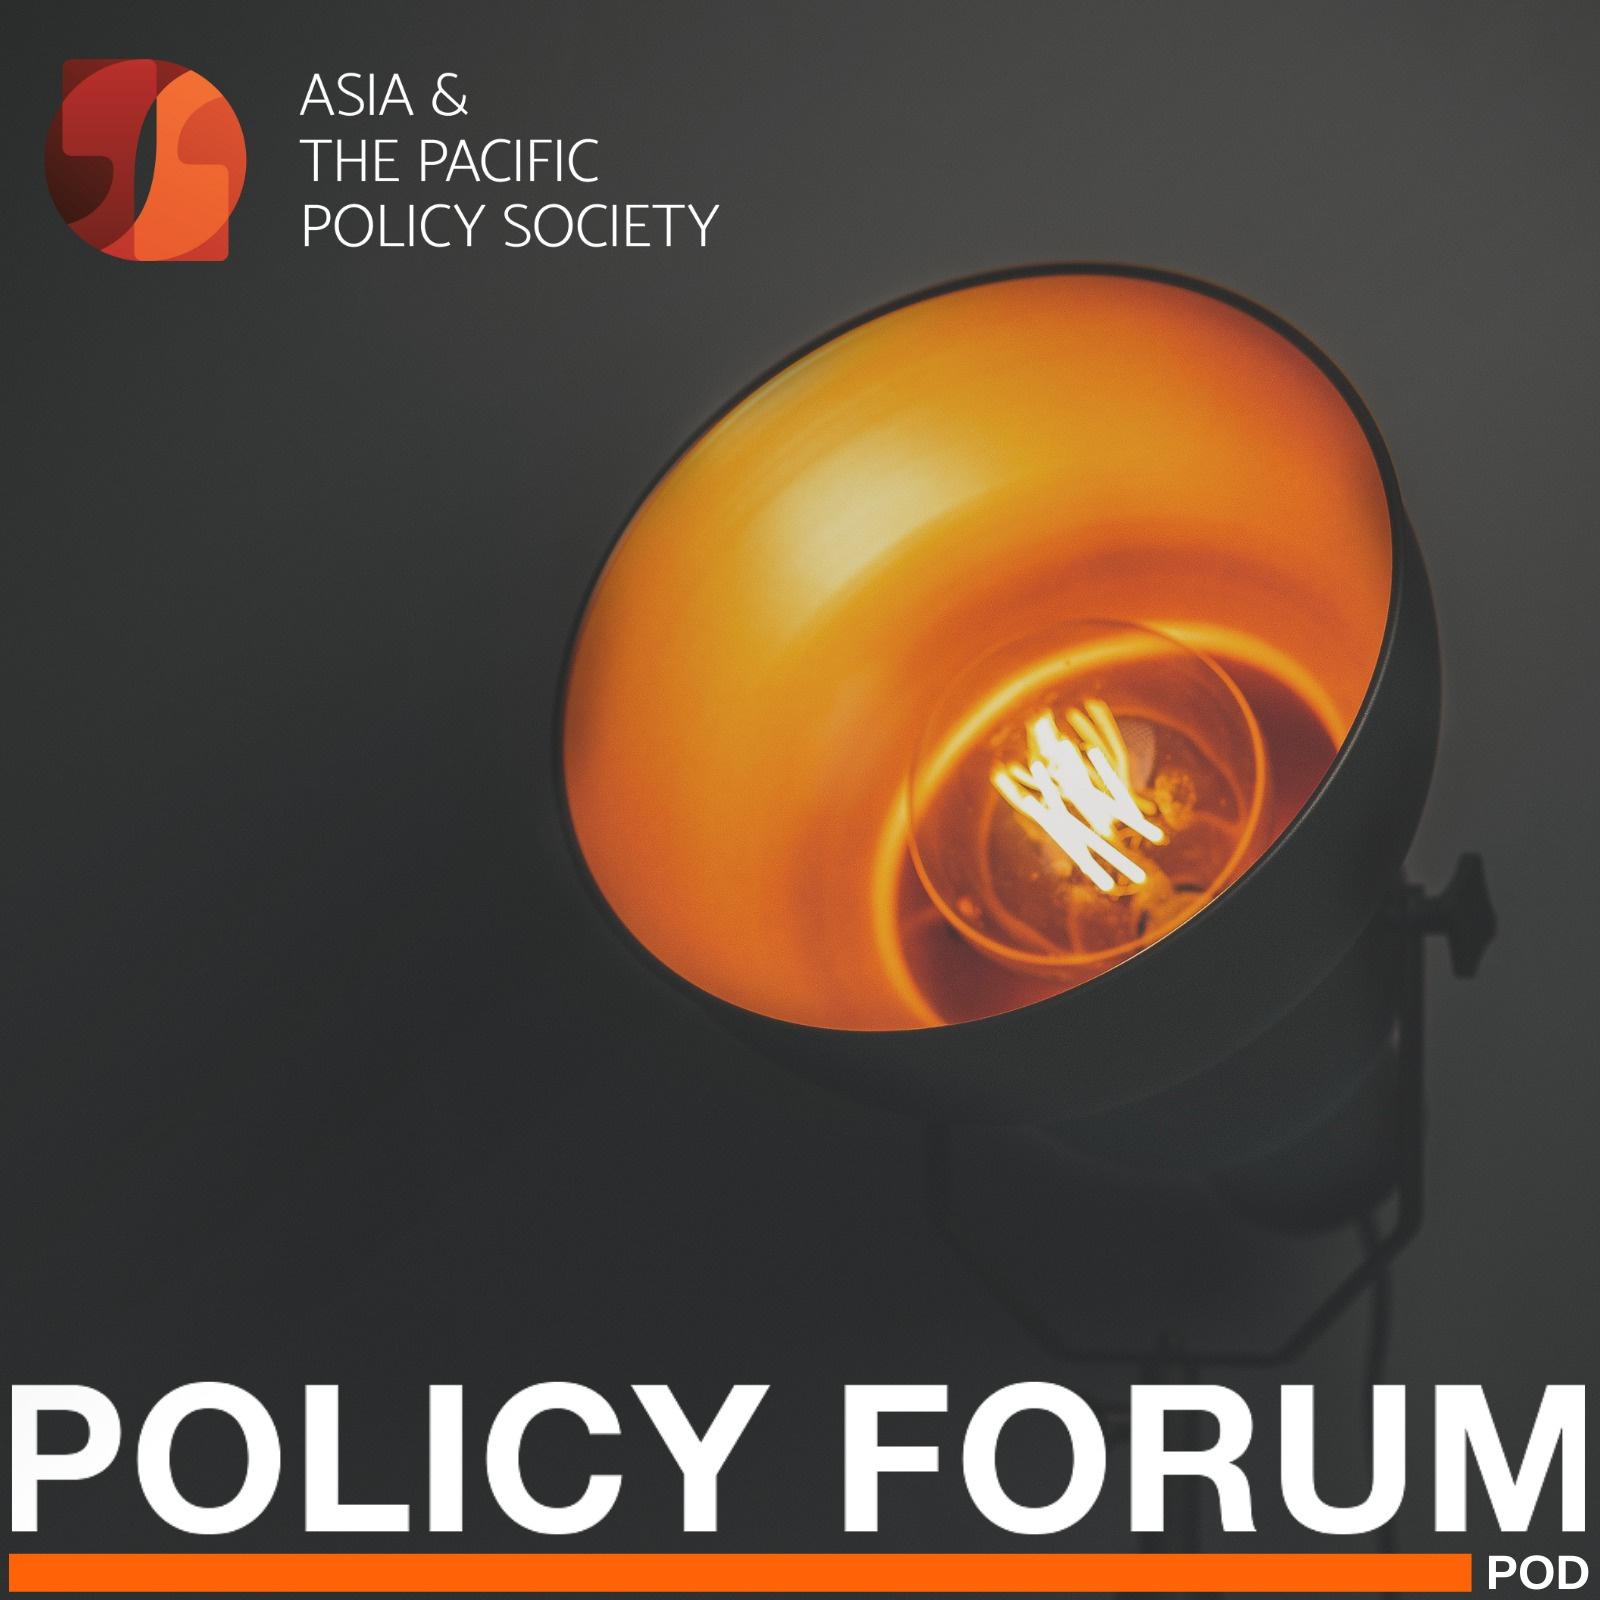 Policy Forum Pod